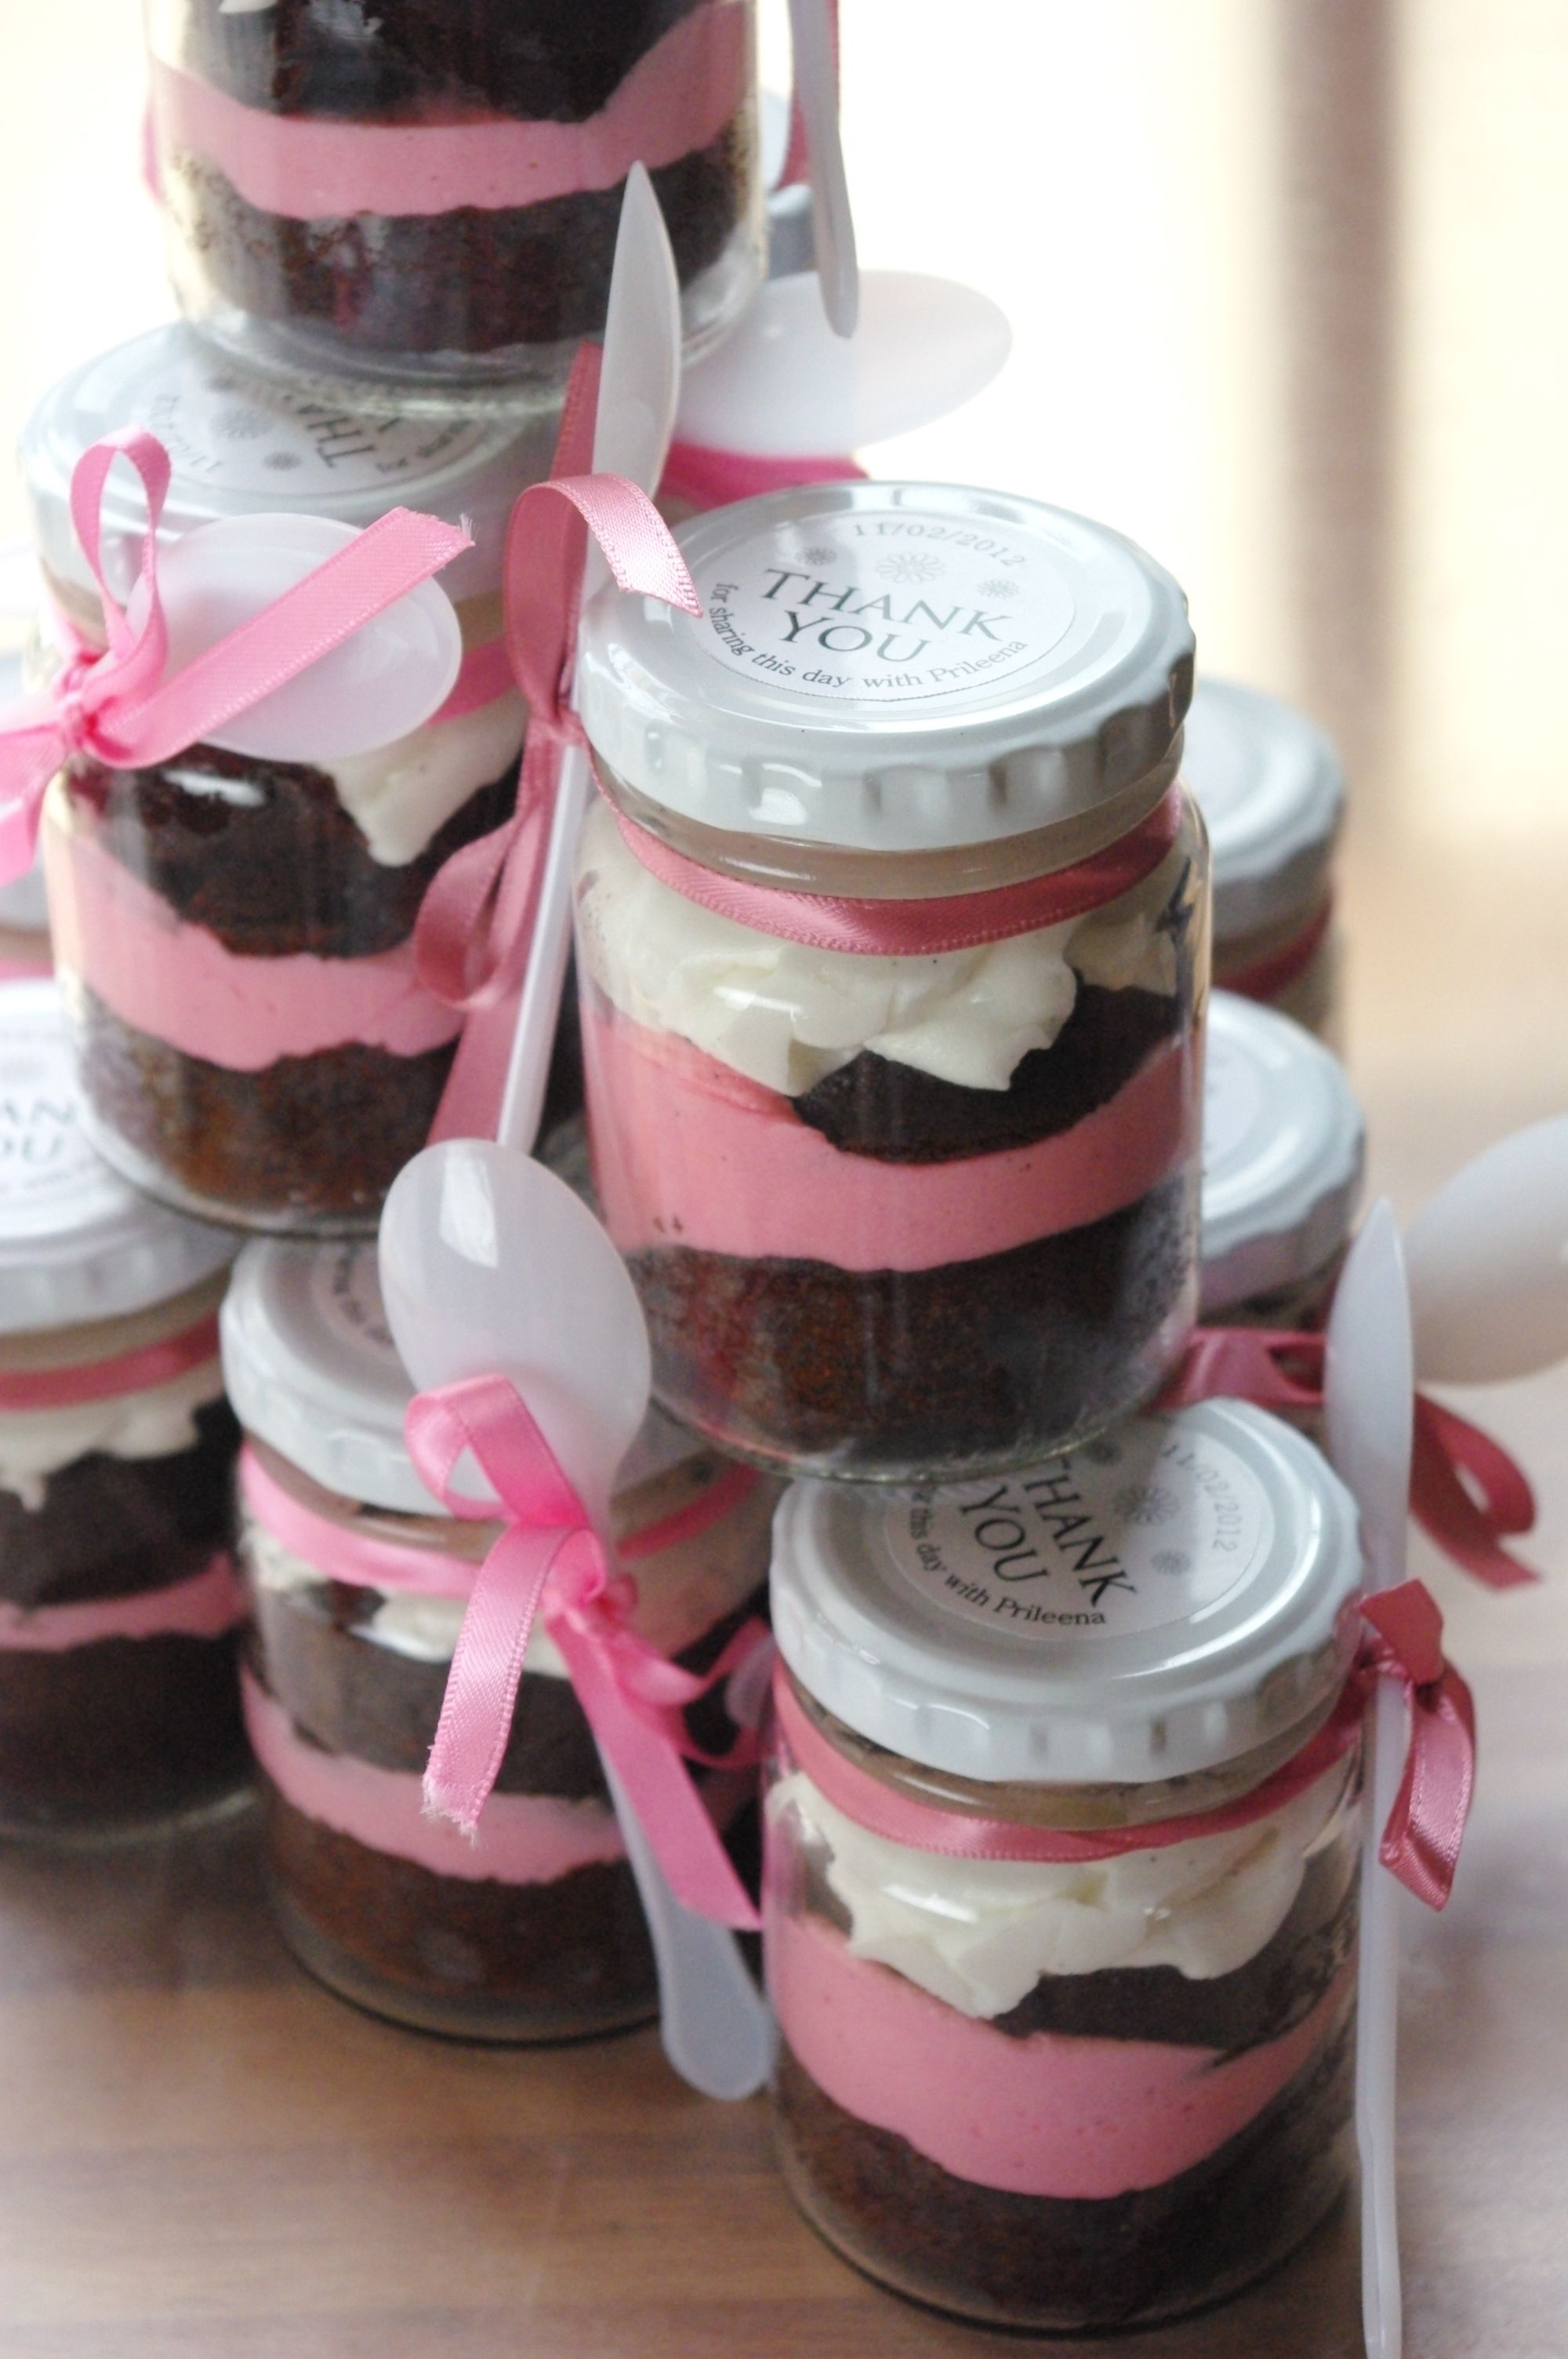 45+ Cake in a jar gift ideas in 2021